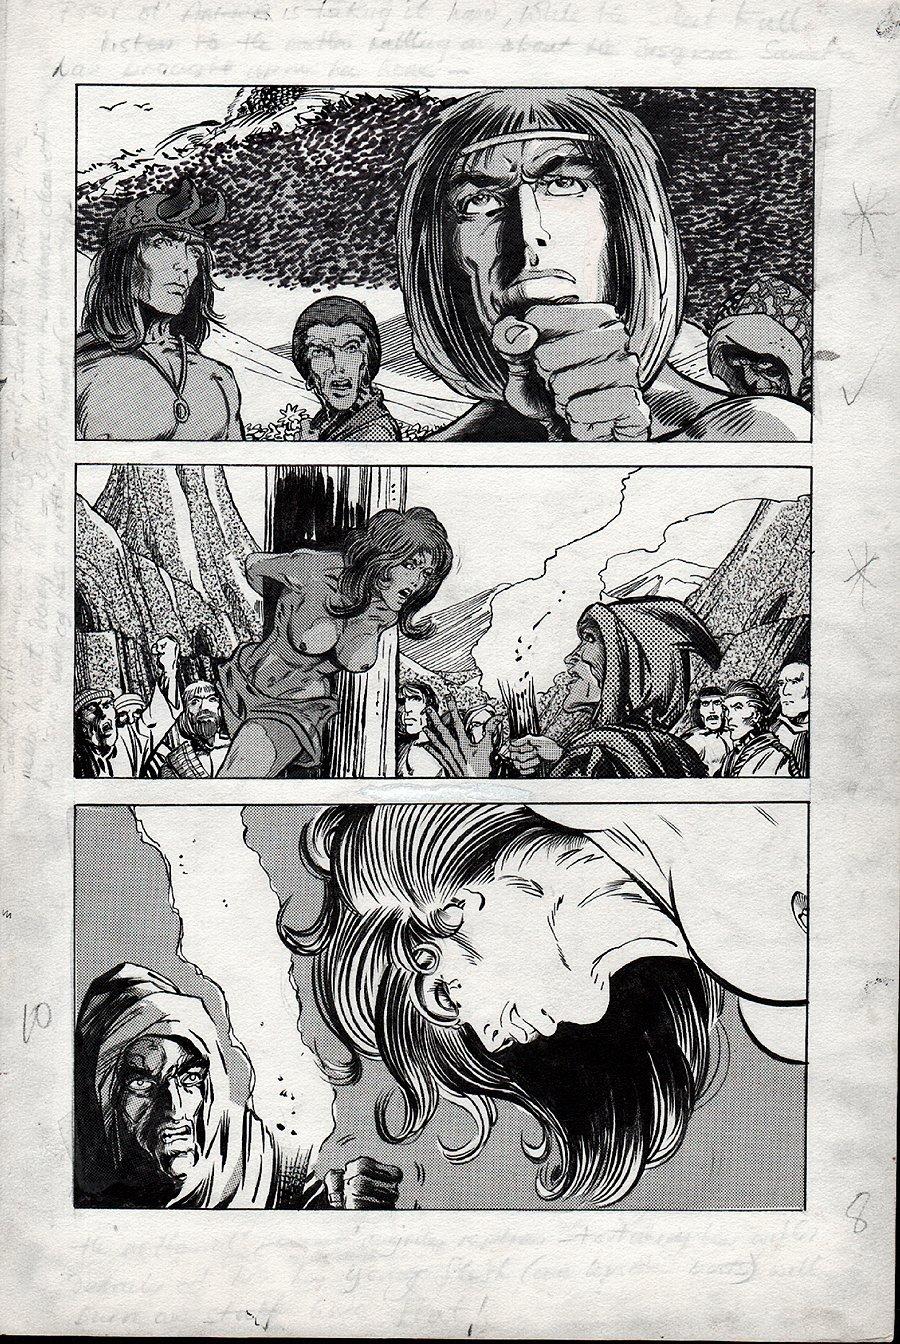 Kull Of Atlantis p 10 (Precursor To Conan The Barbarian #1) 1969-1970